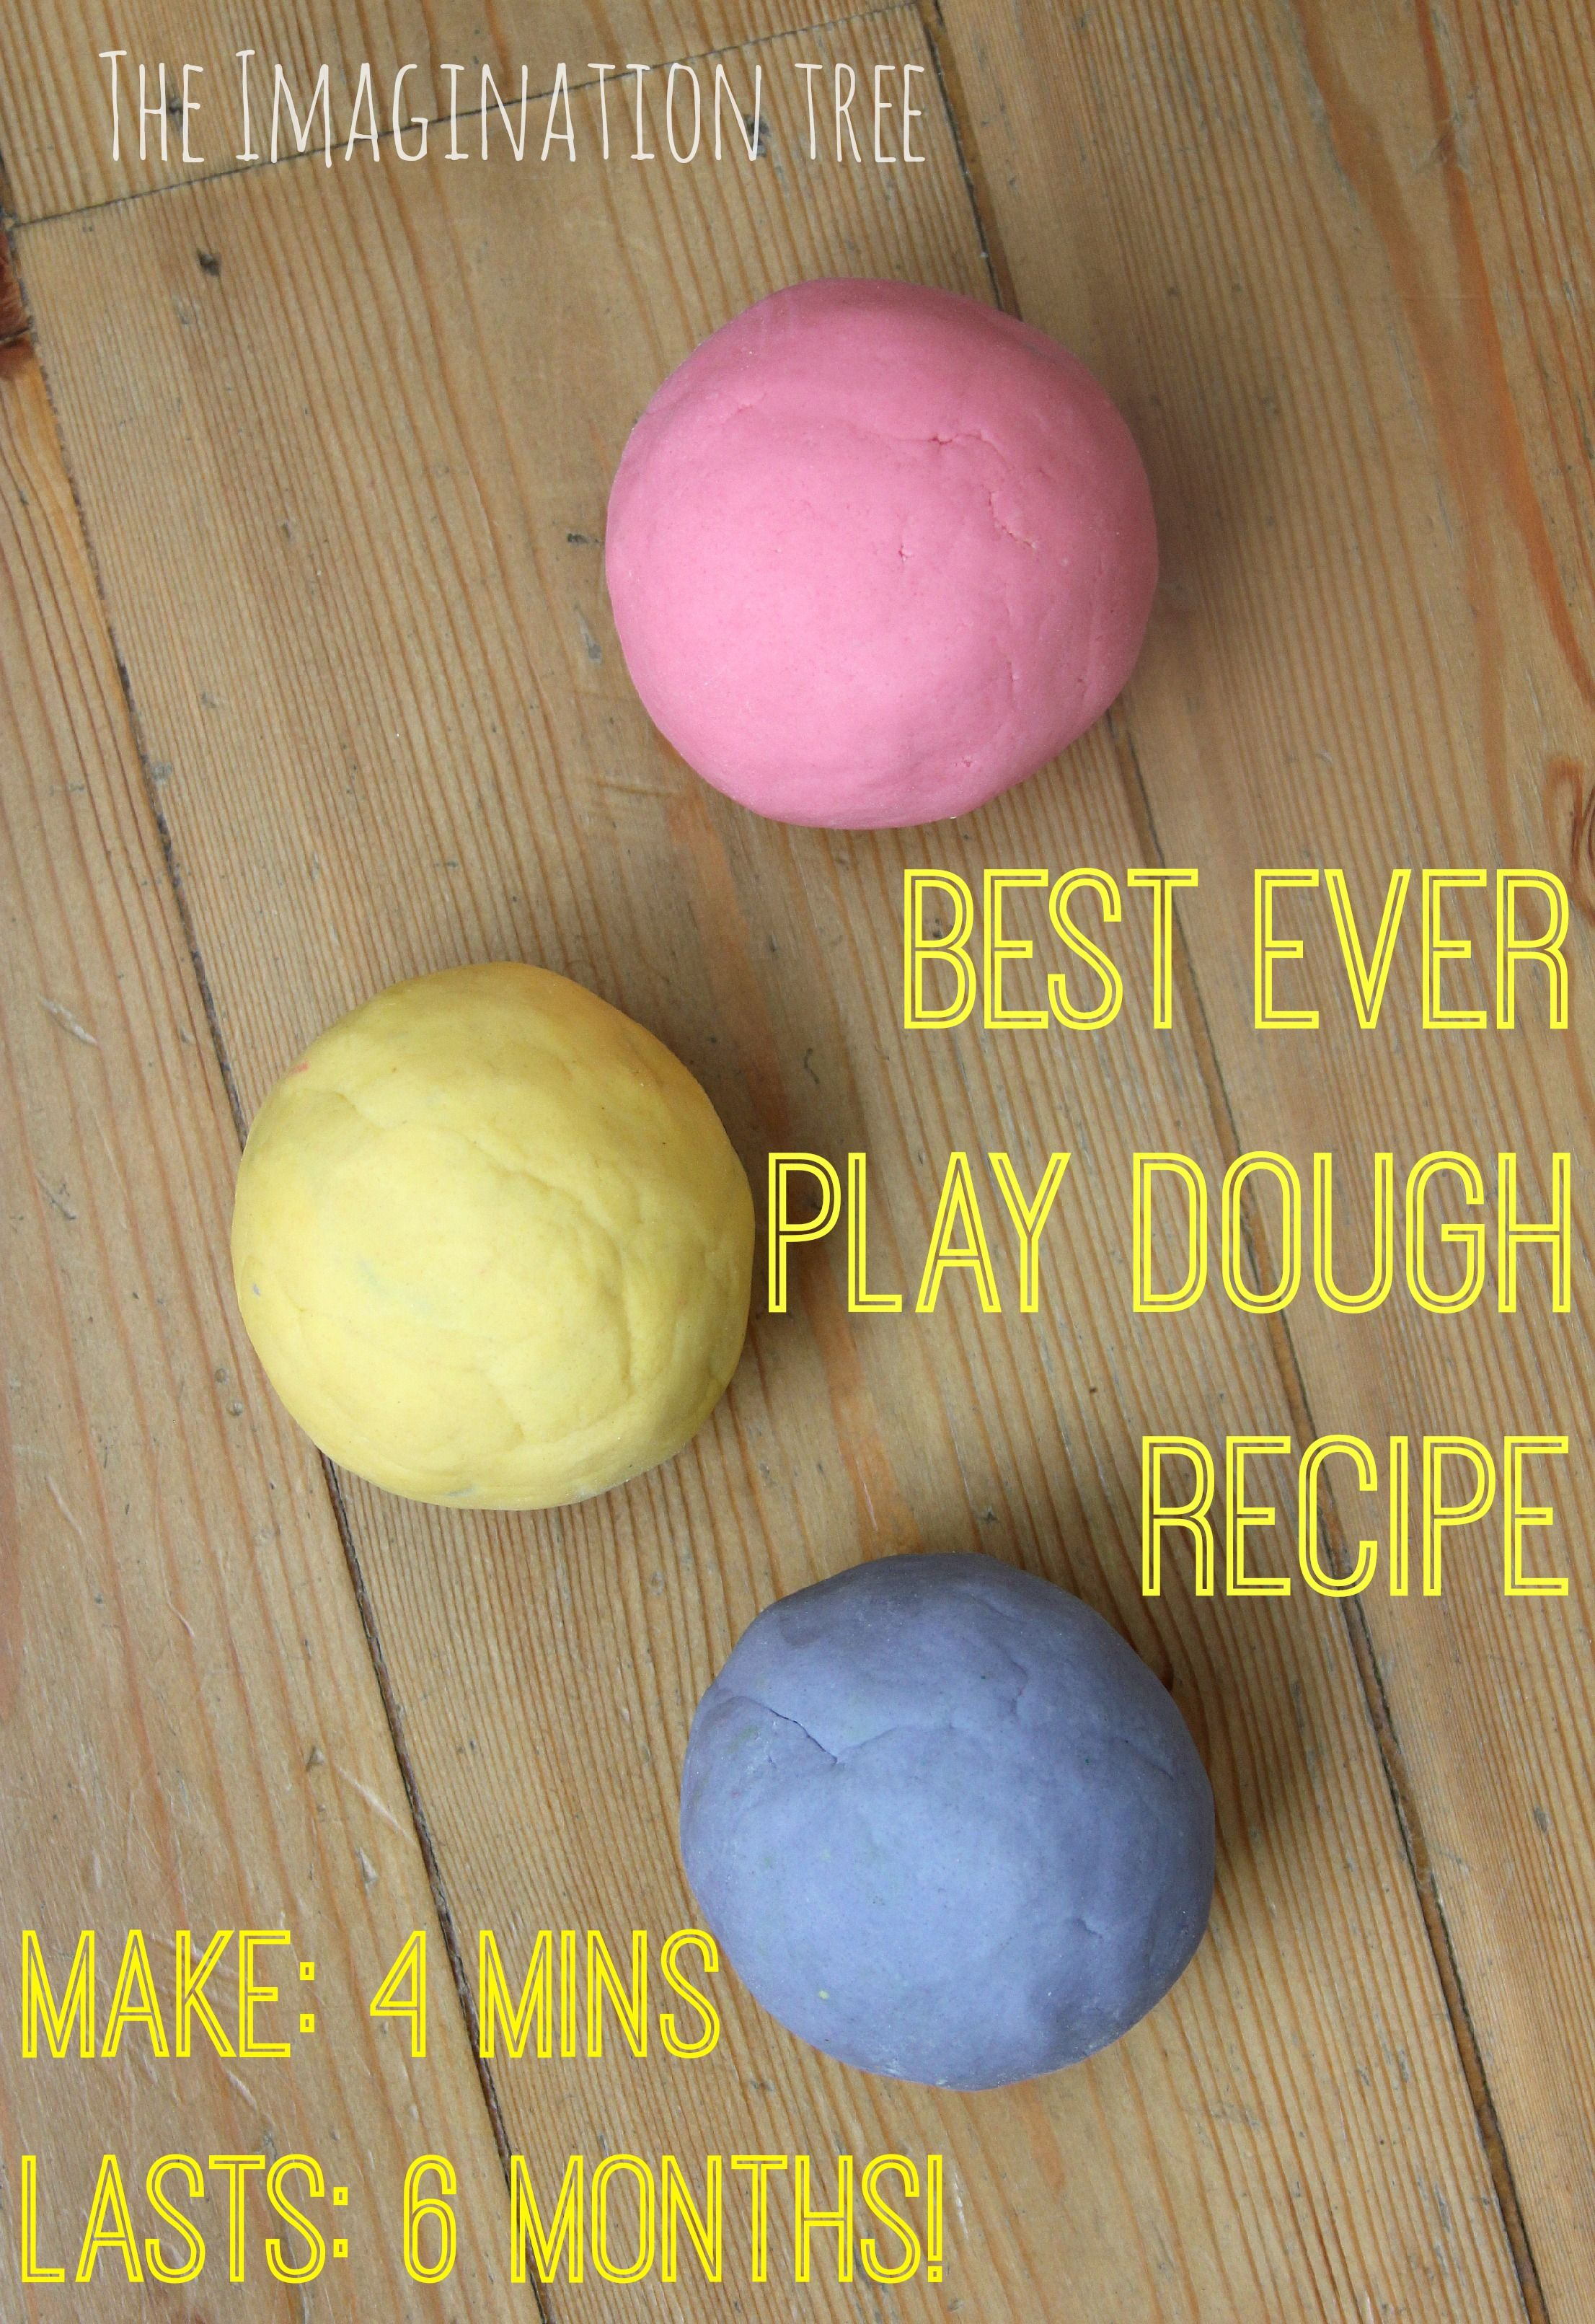 Best Ever No Cook Play Dough Recipe The Imagination Tree Playdough Playdough Recipe Imagination Tree